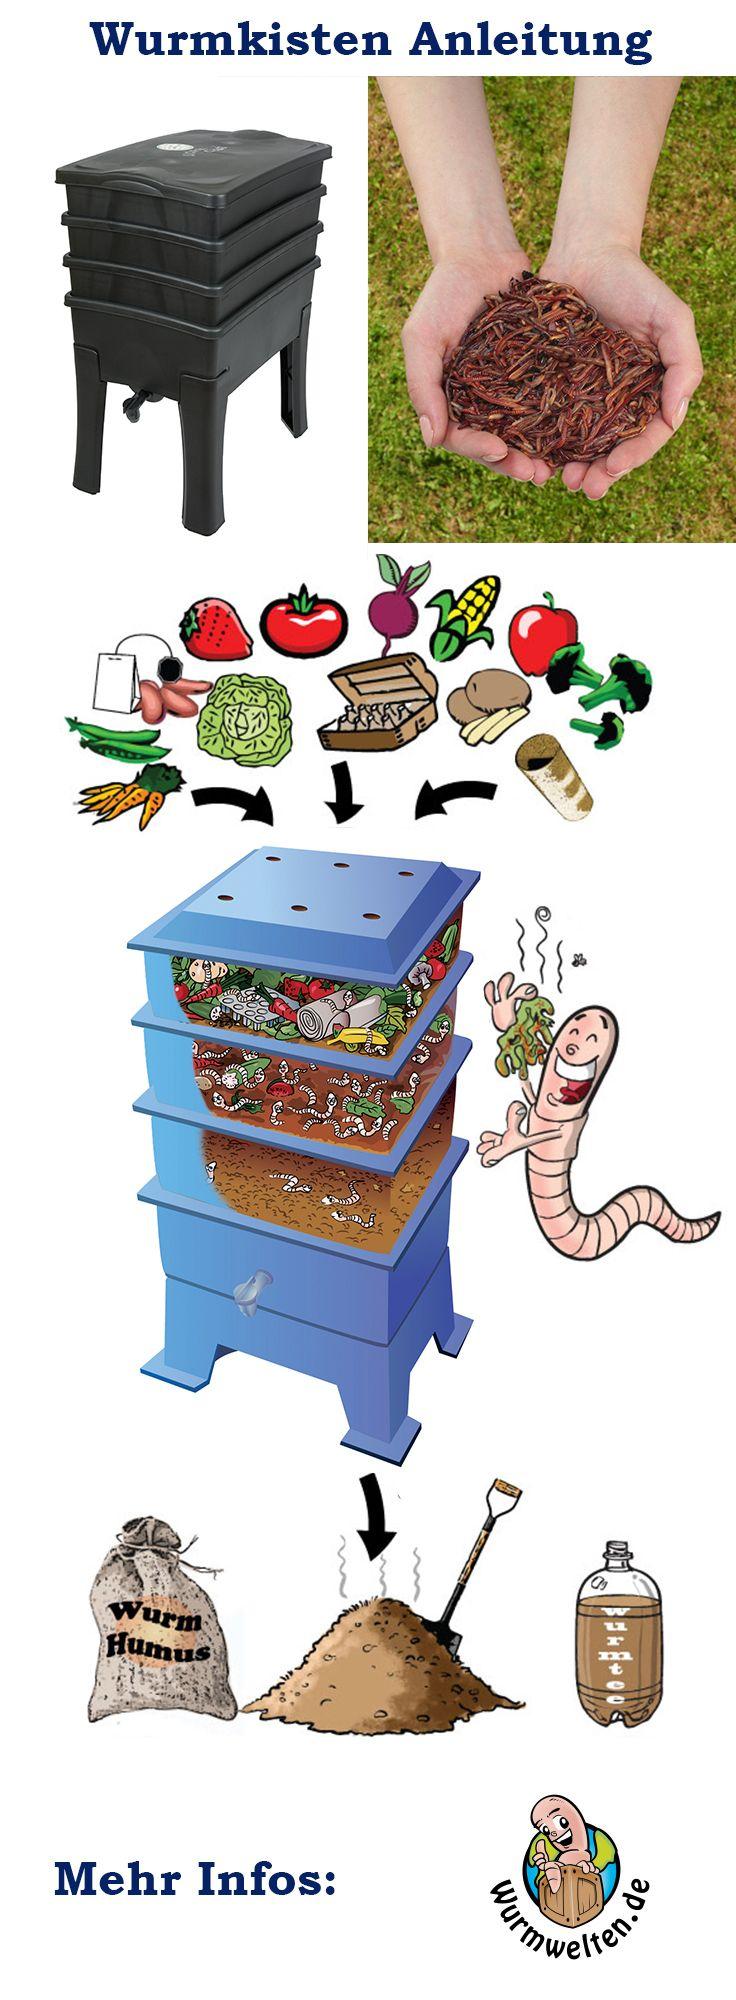 wurm cafe wurmfarm starter set mit kompostw rmern wurmkisten anleitung pinterest kompost. Black Bedroom Furniture Sets. Home Design Ideas